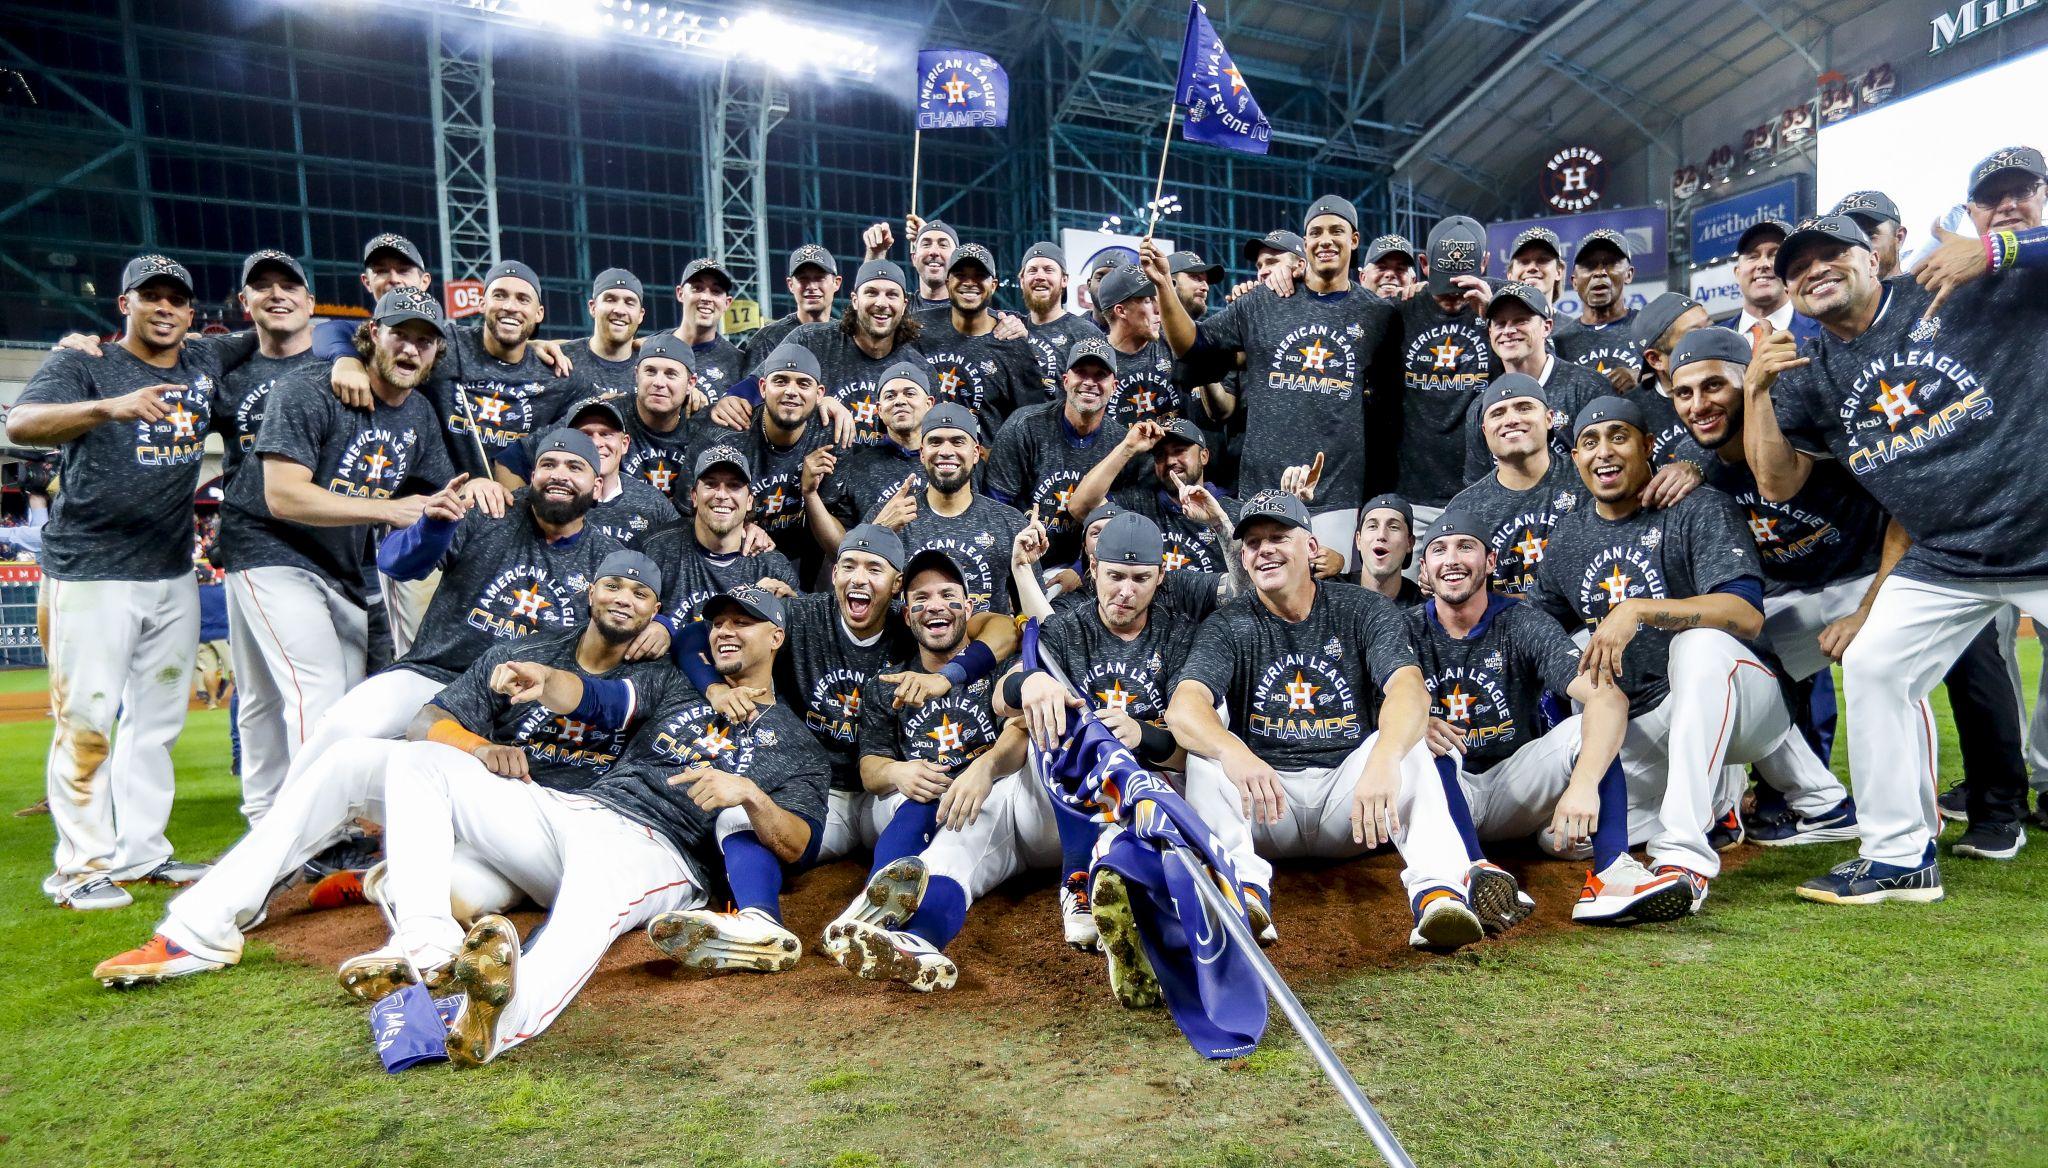 Creech: Jose Altuve adds to his Astros legacy